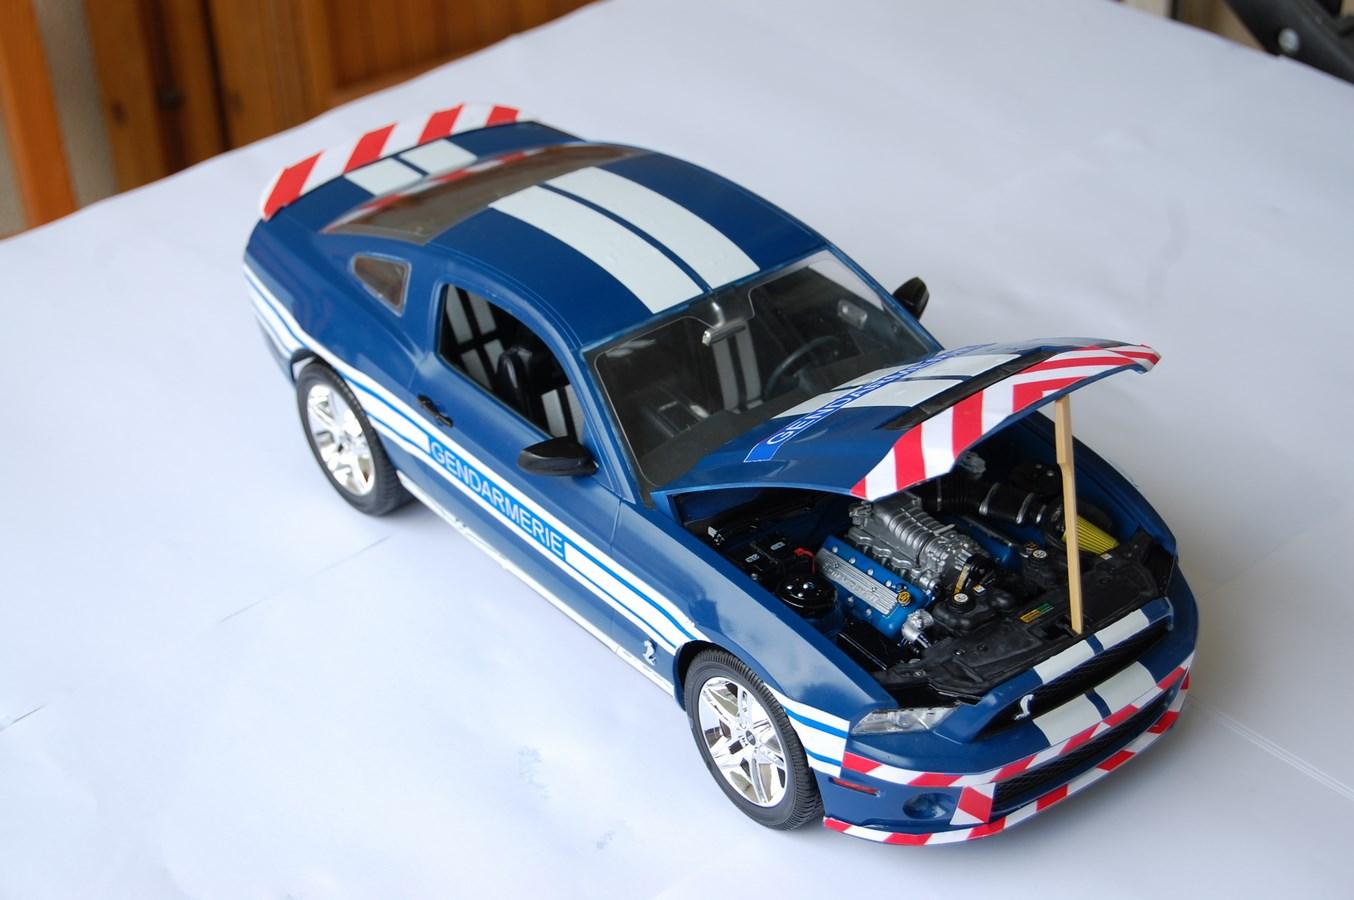 Shelby GT 500 version imaginaire Gendarmerie - Page 2 385481Mustang47Copier